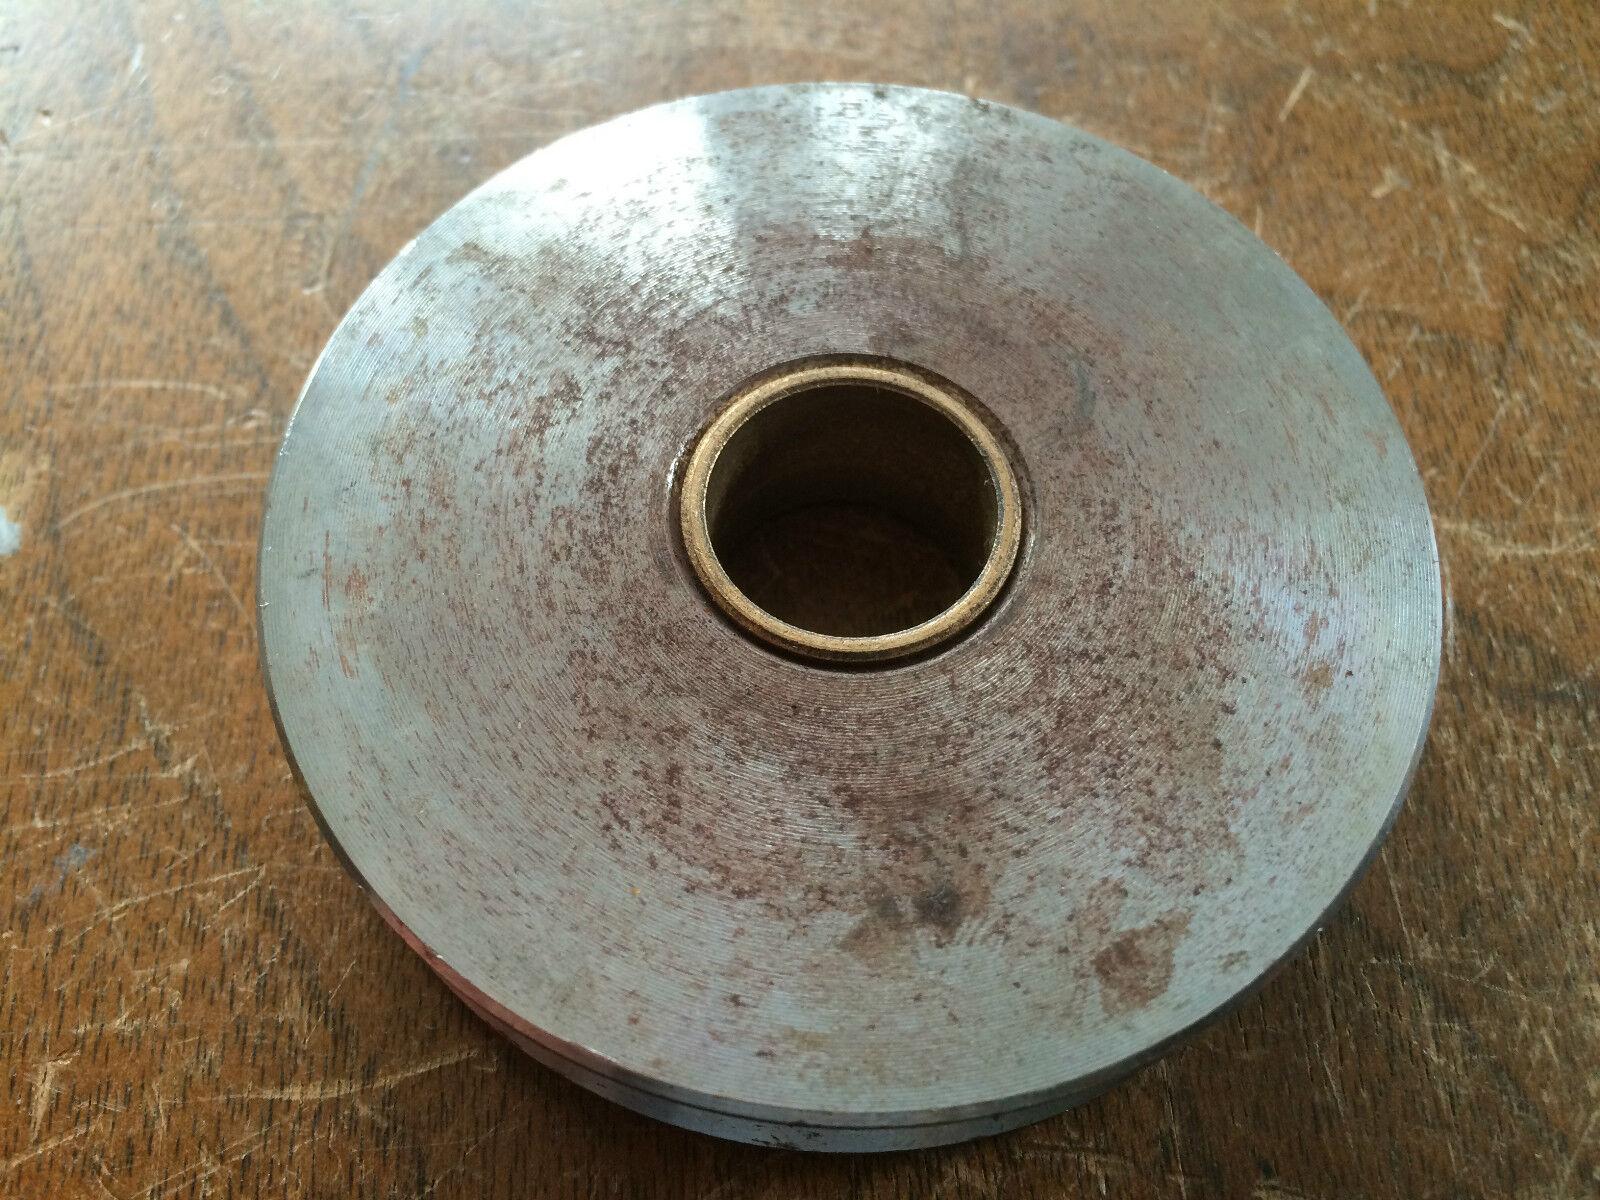 "NOS Delta Rockwell Metal Lathe 3"" Idler Pulley p/n 414013625001 Bronze Bushing"